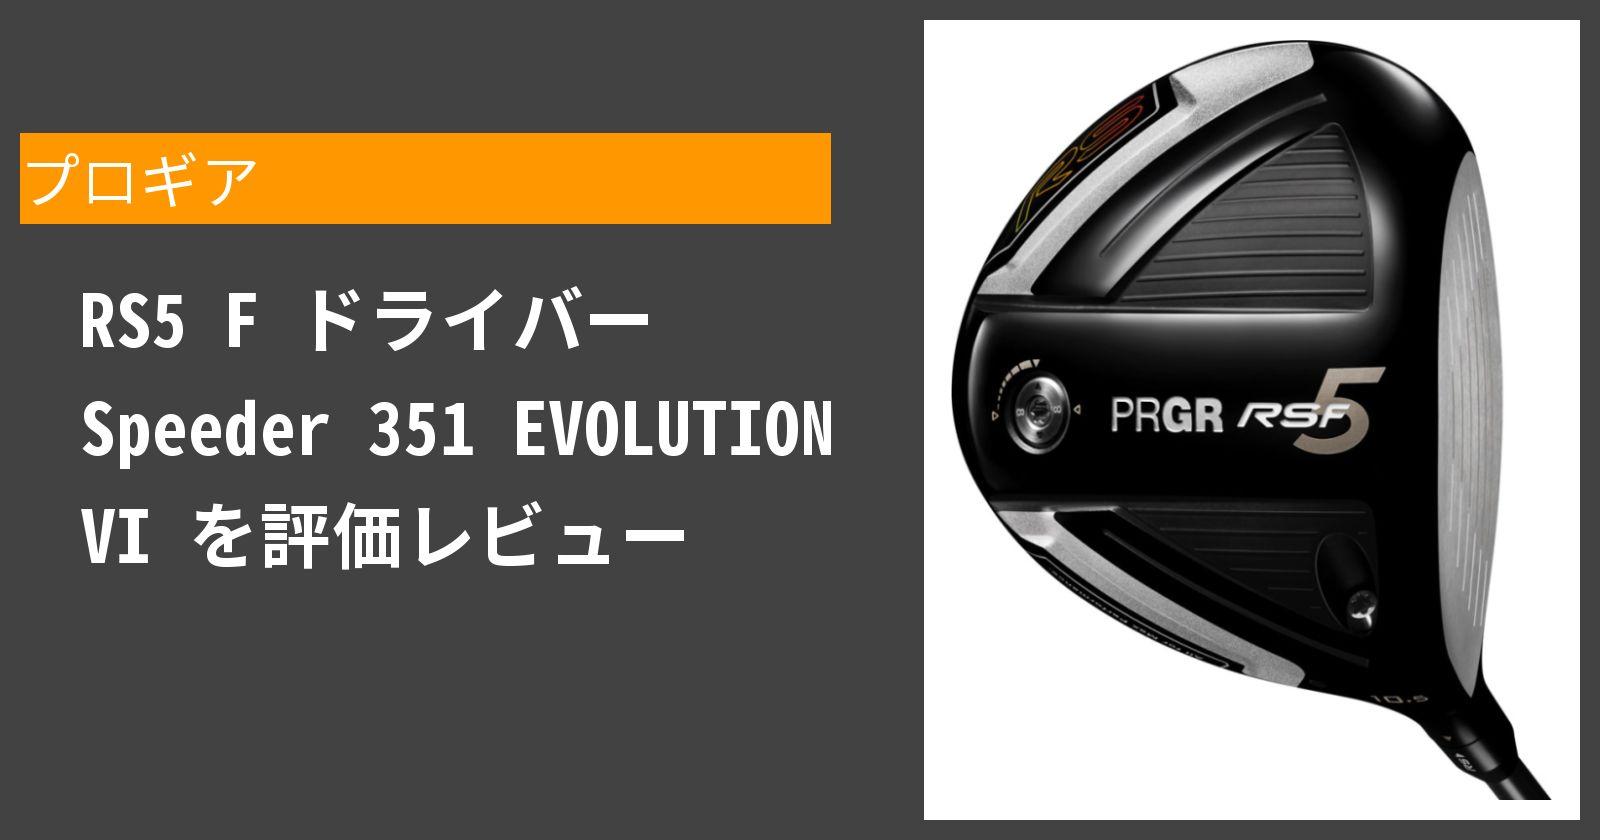 RS5 F ドライバー Speeder 351 EVOLUTION VIを徹底評価